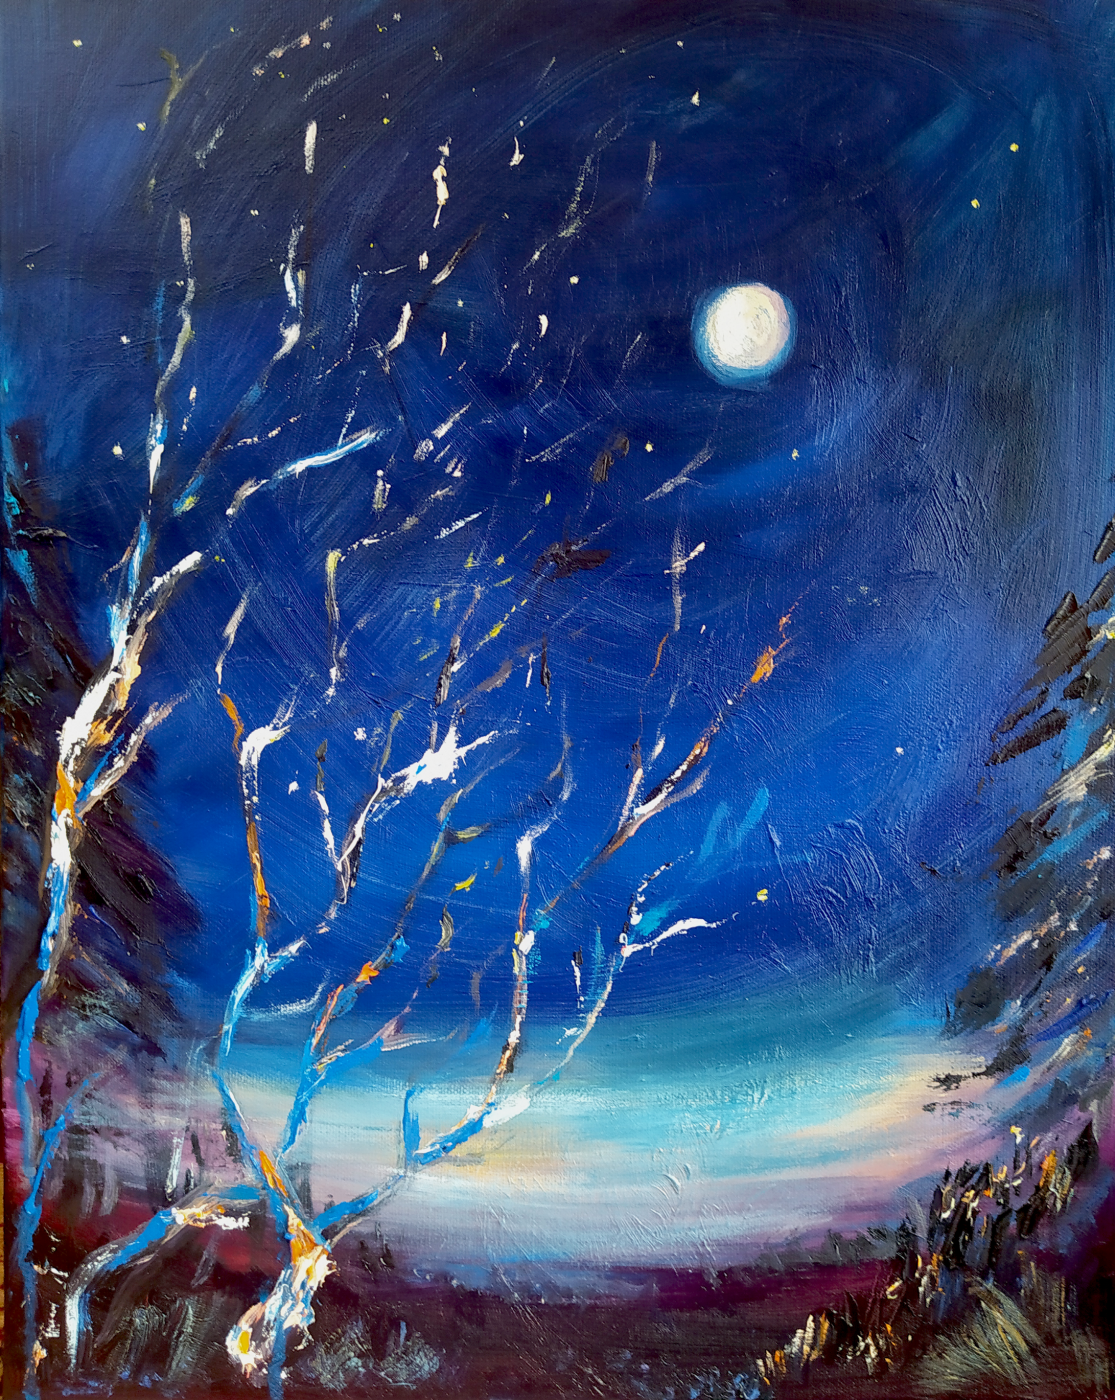 Naddalena. Winter full moon